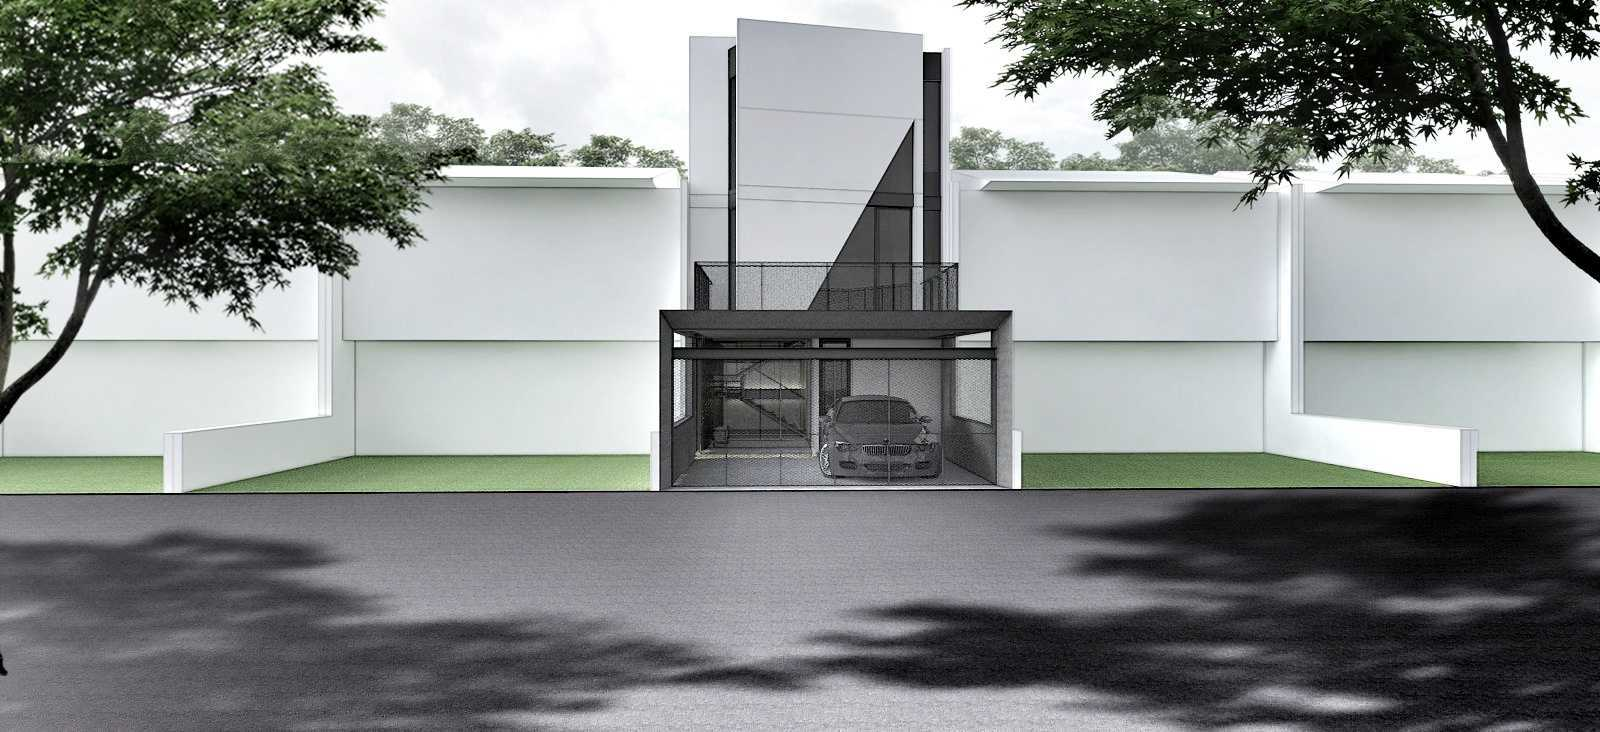 Q Studio F House Kec. Serpong, Kota Tangerang Selatan, Banten, Indonesia Kec. Serpong, Kota Tangerang Selatan, Banten, Indonesia Q-Studio-F-House  72680